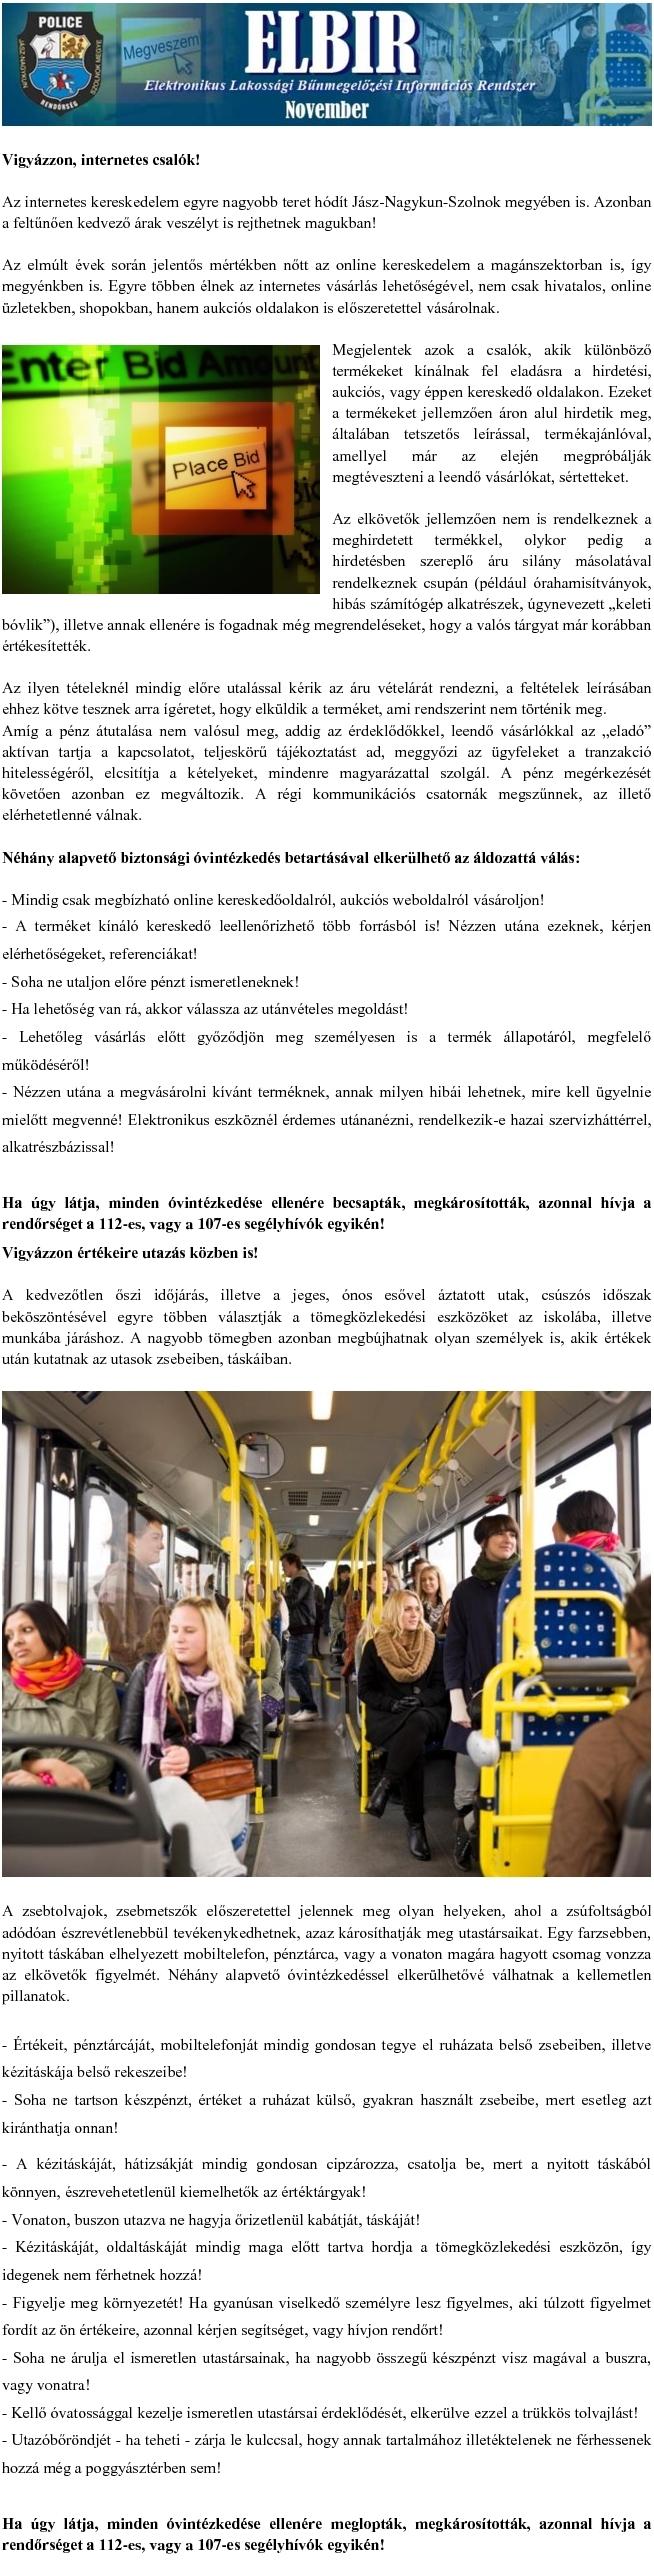 elbir_2016_november